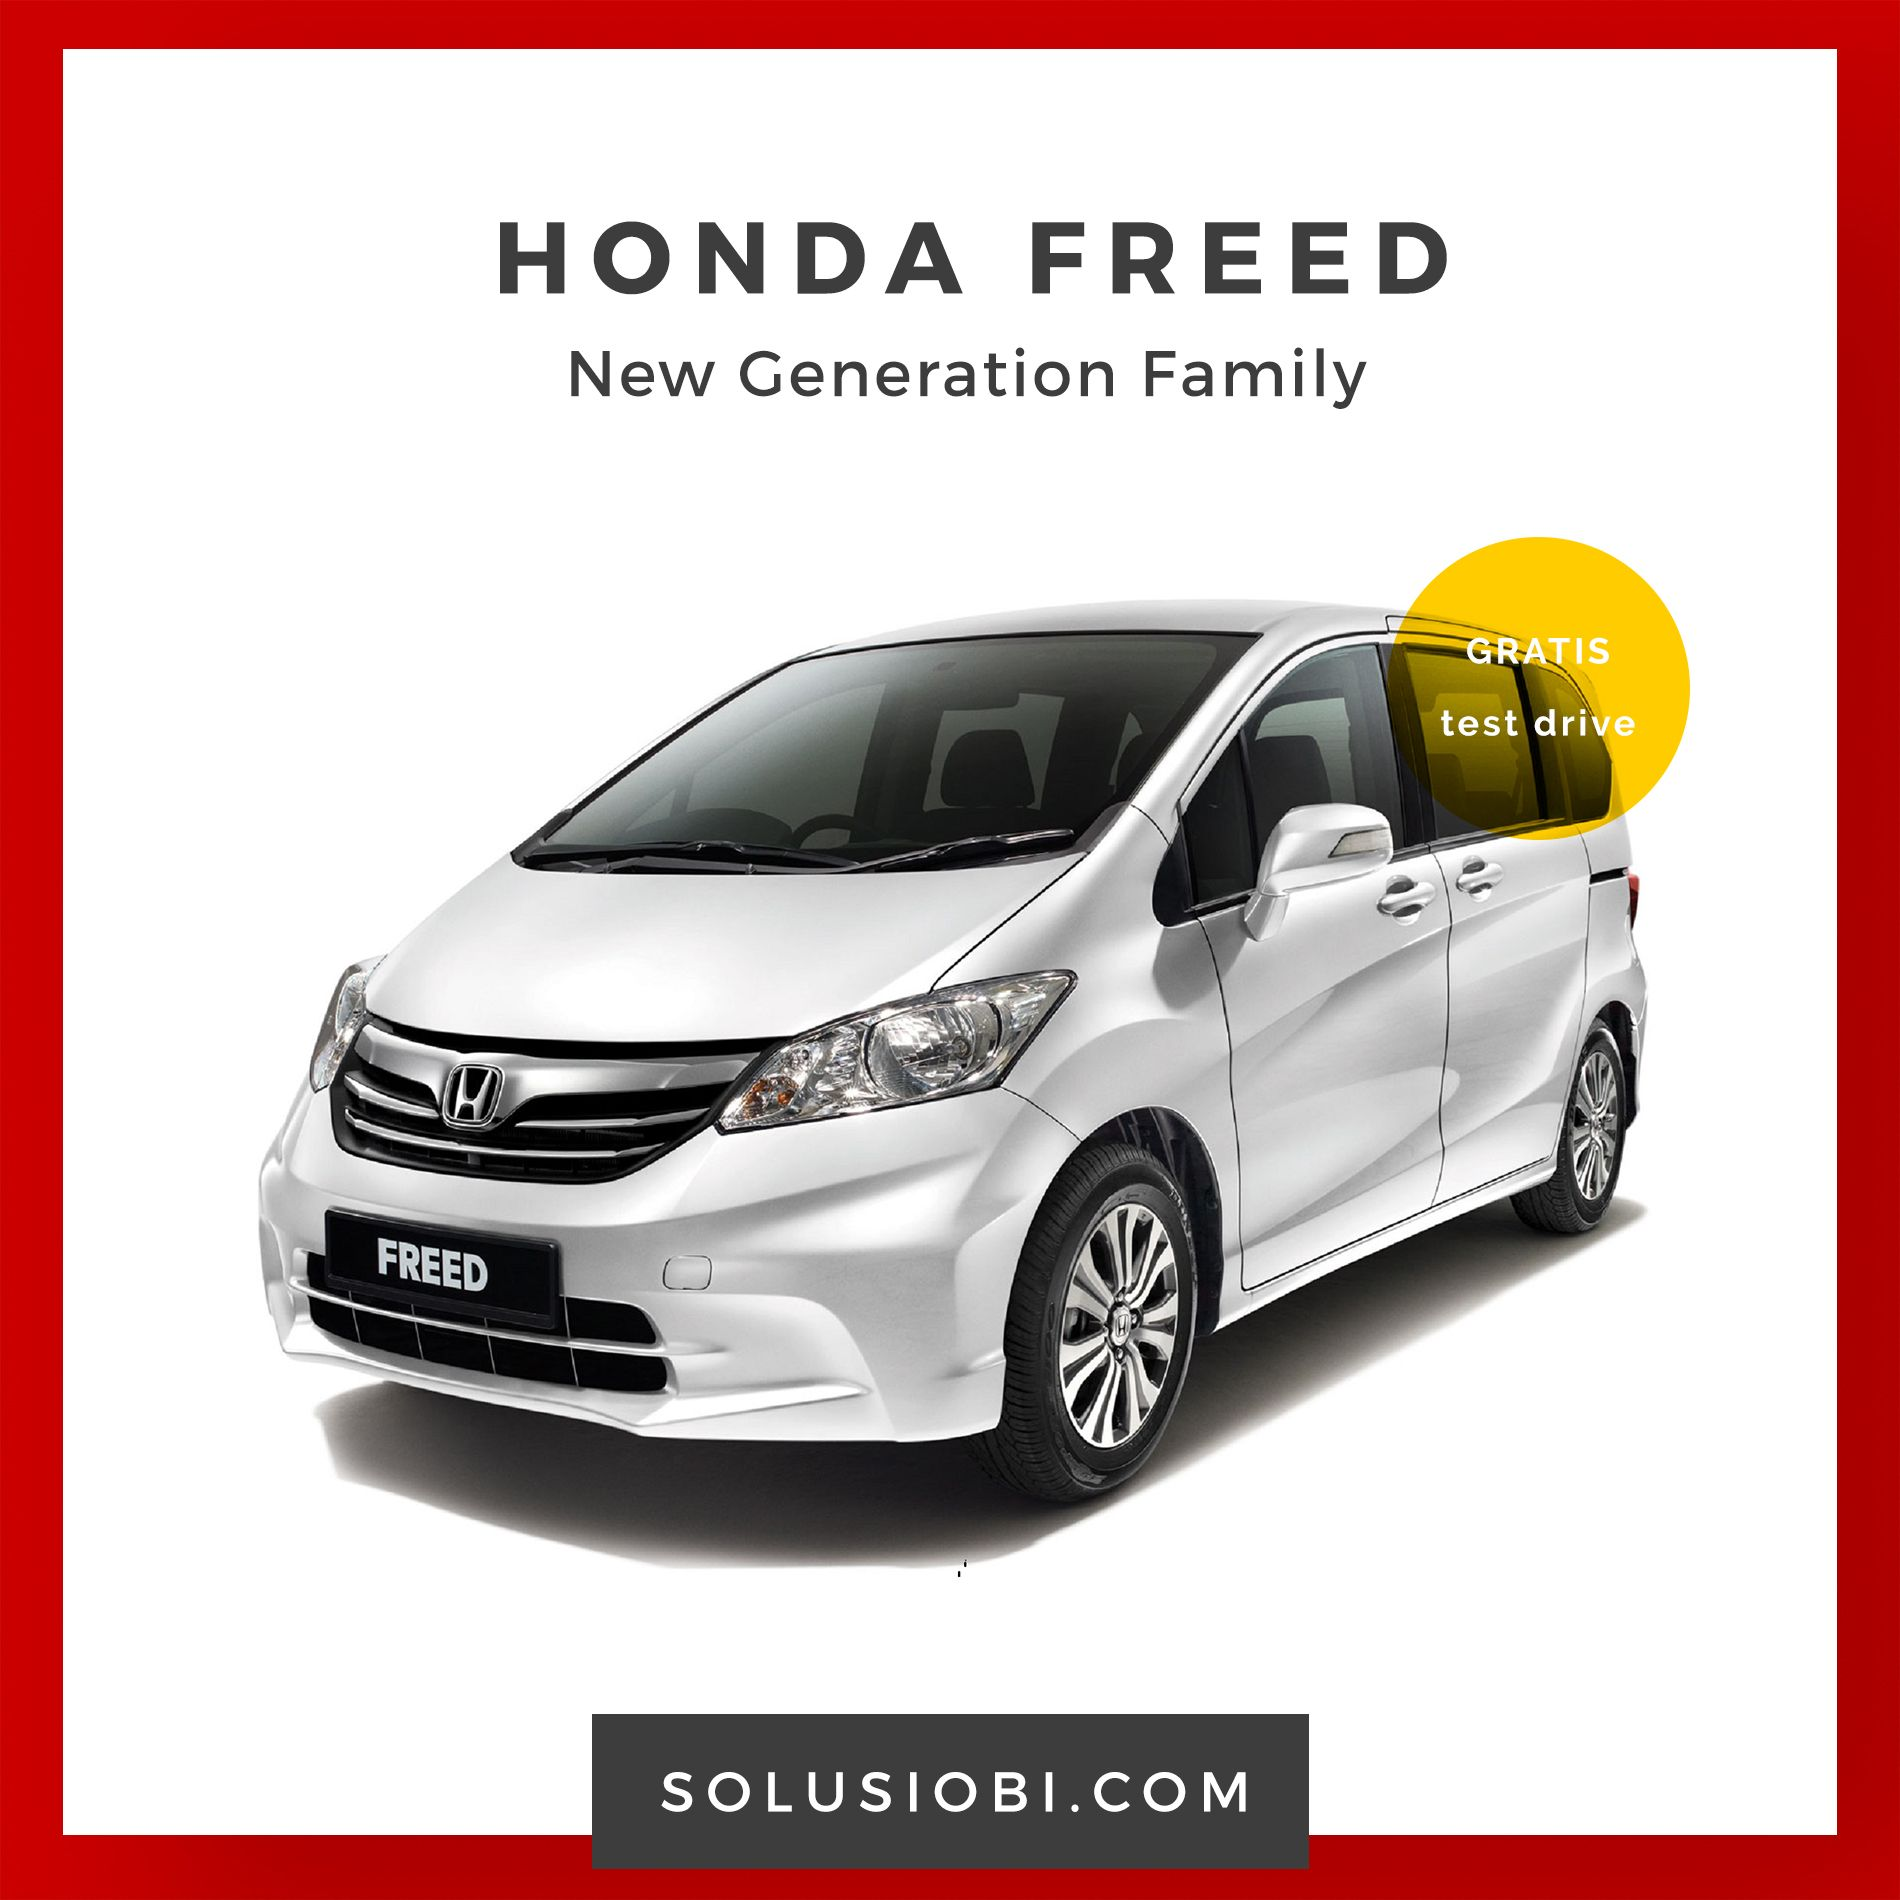 Mobil Honda Freed keluaran Terbaru 2017 | Mobil, Honda ...